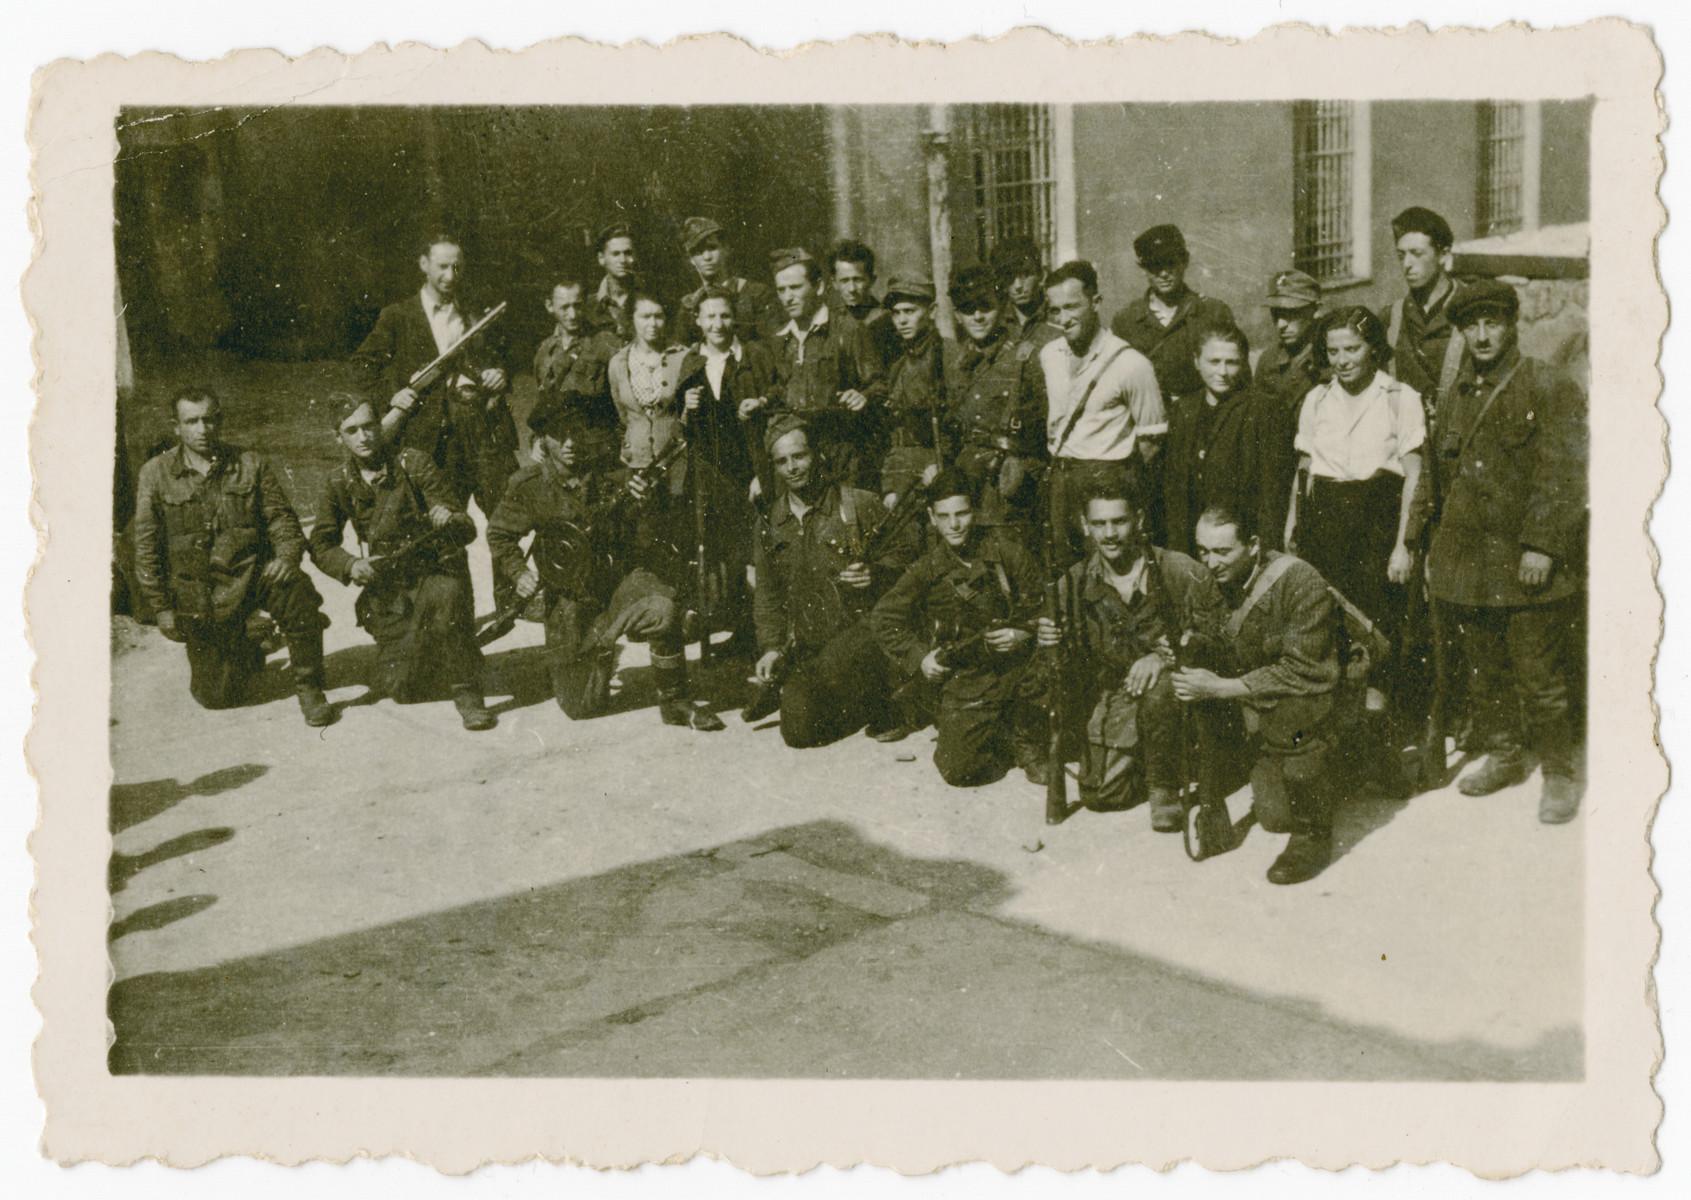 A photograph depicting members of the Fareynikte Partizaner Organizatsye (FPO), a Jewish partisan organization in Vilnius during the war.